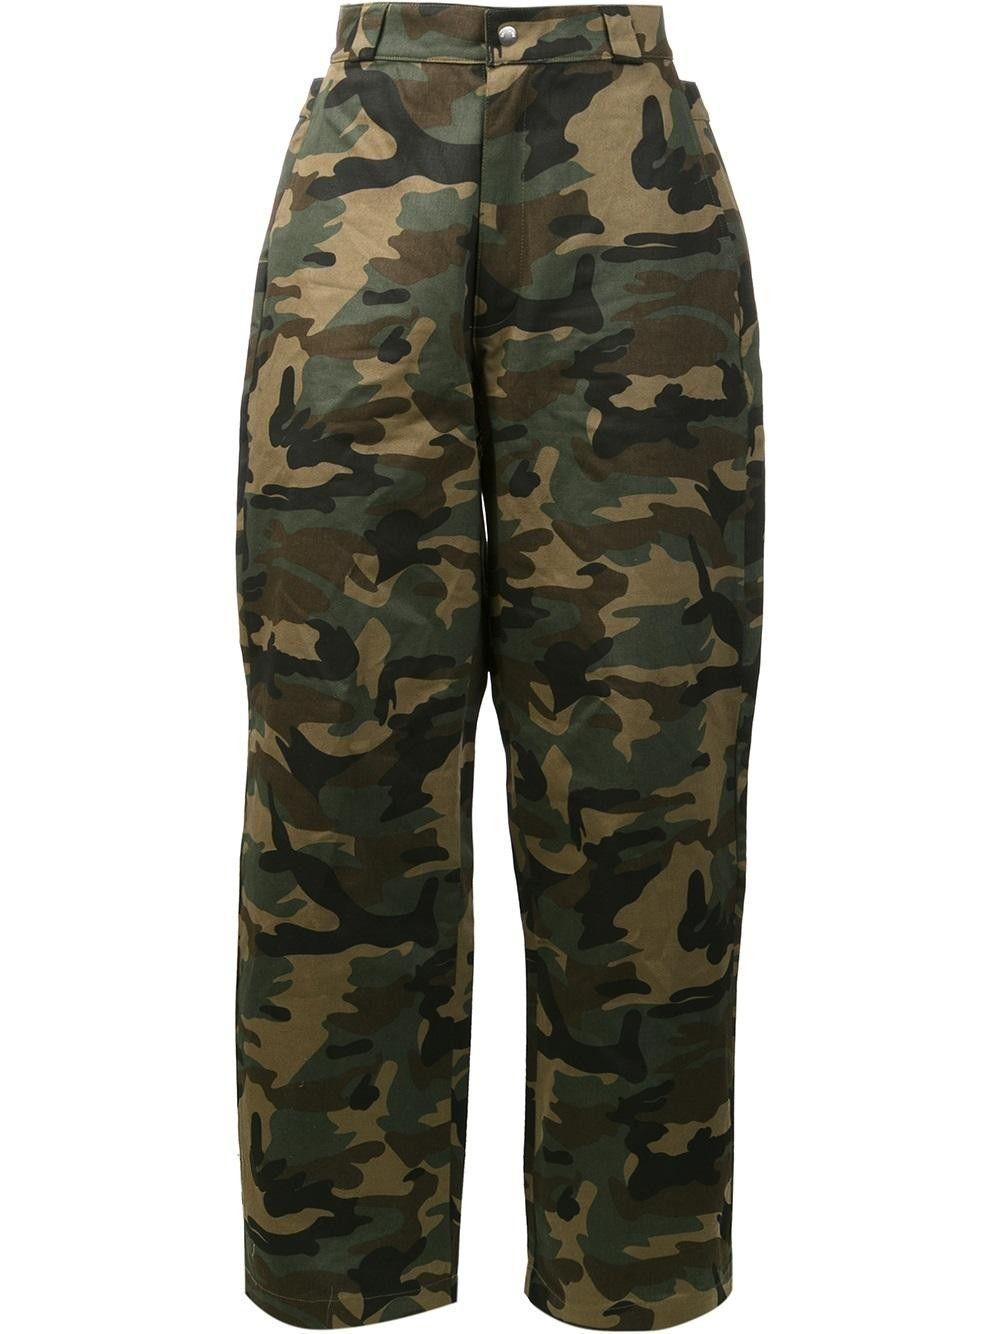 HOOD BY AIR camouflage print trousers. #hoodbyair #cloth #